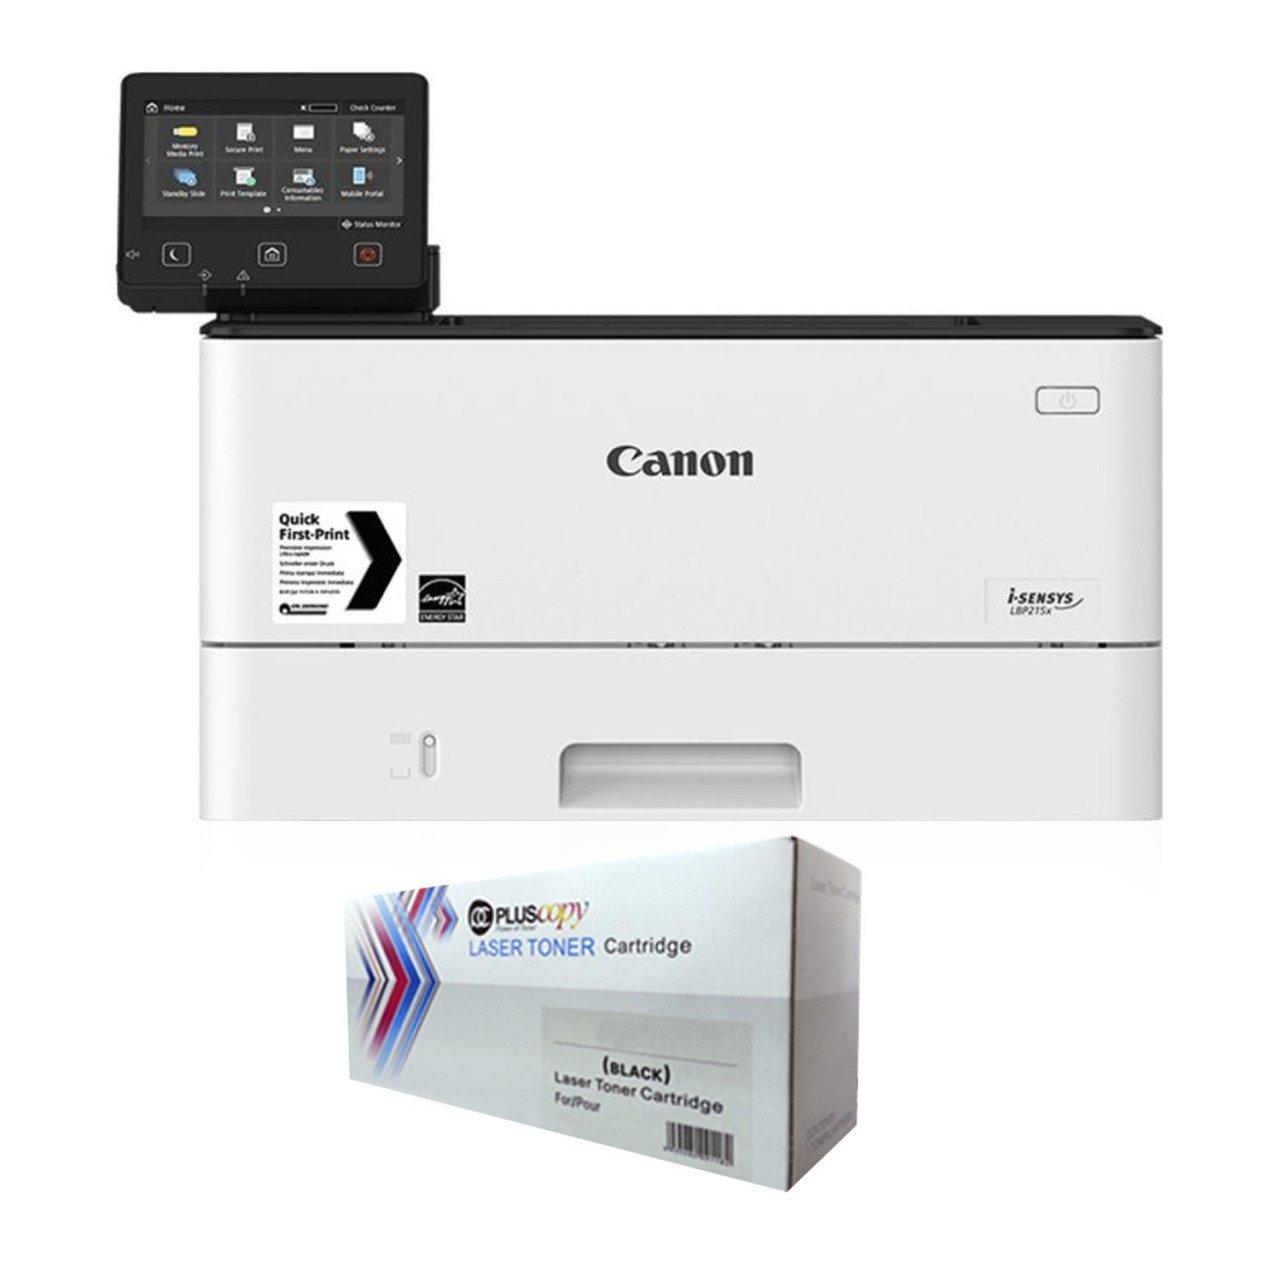 Canon LBP223DW Photocopy + Wi-Fi Duplex Laser Printer Full Pluscopy Tonerli